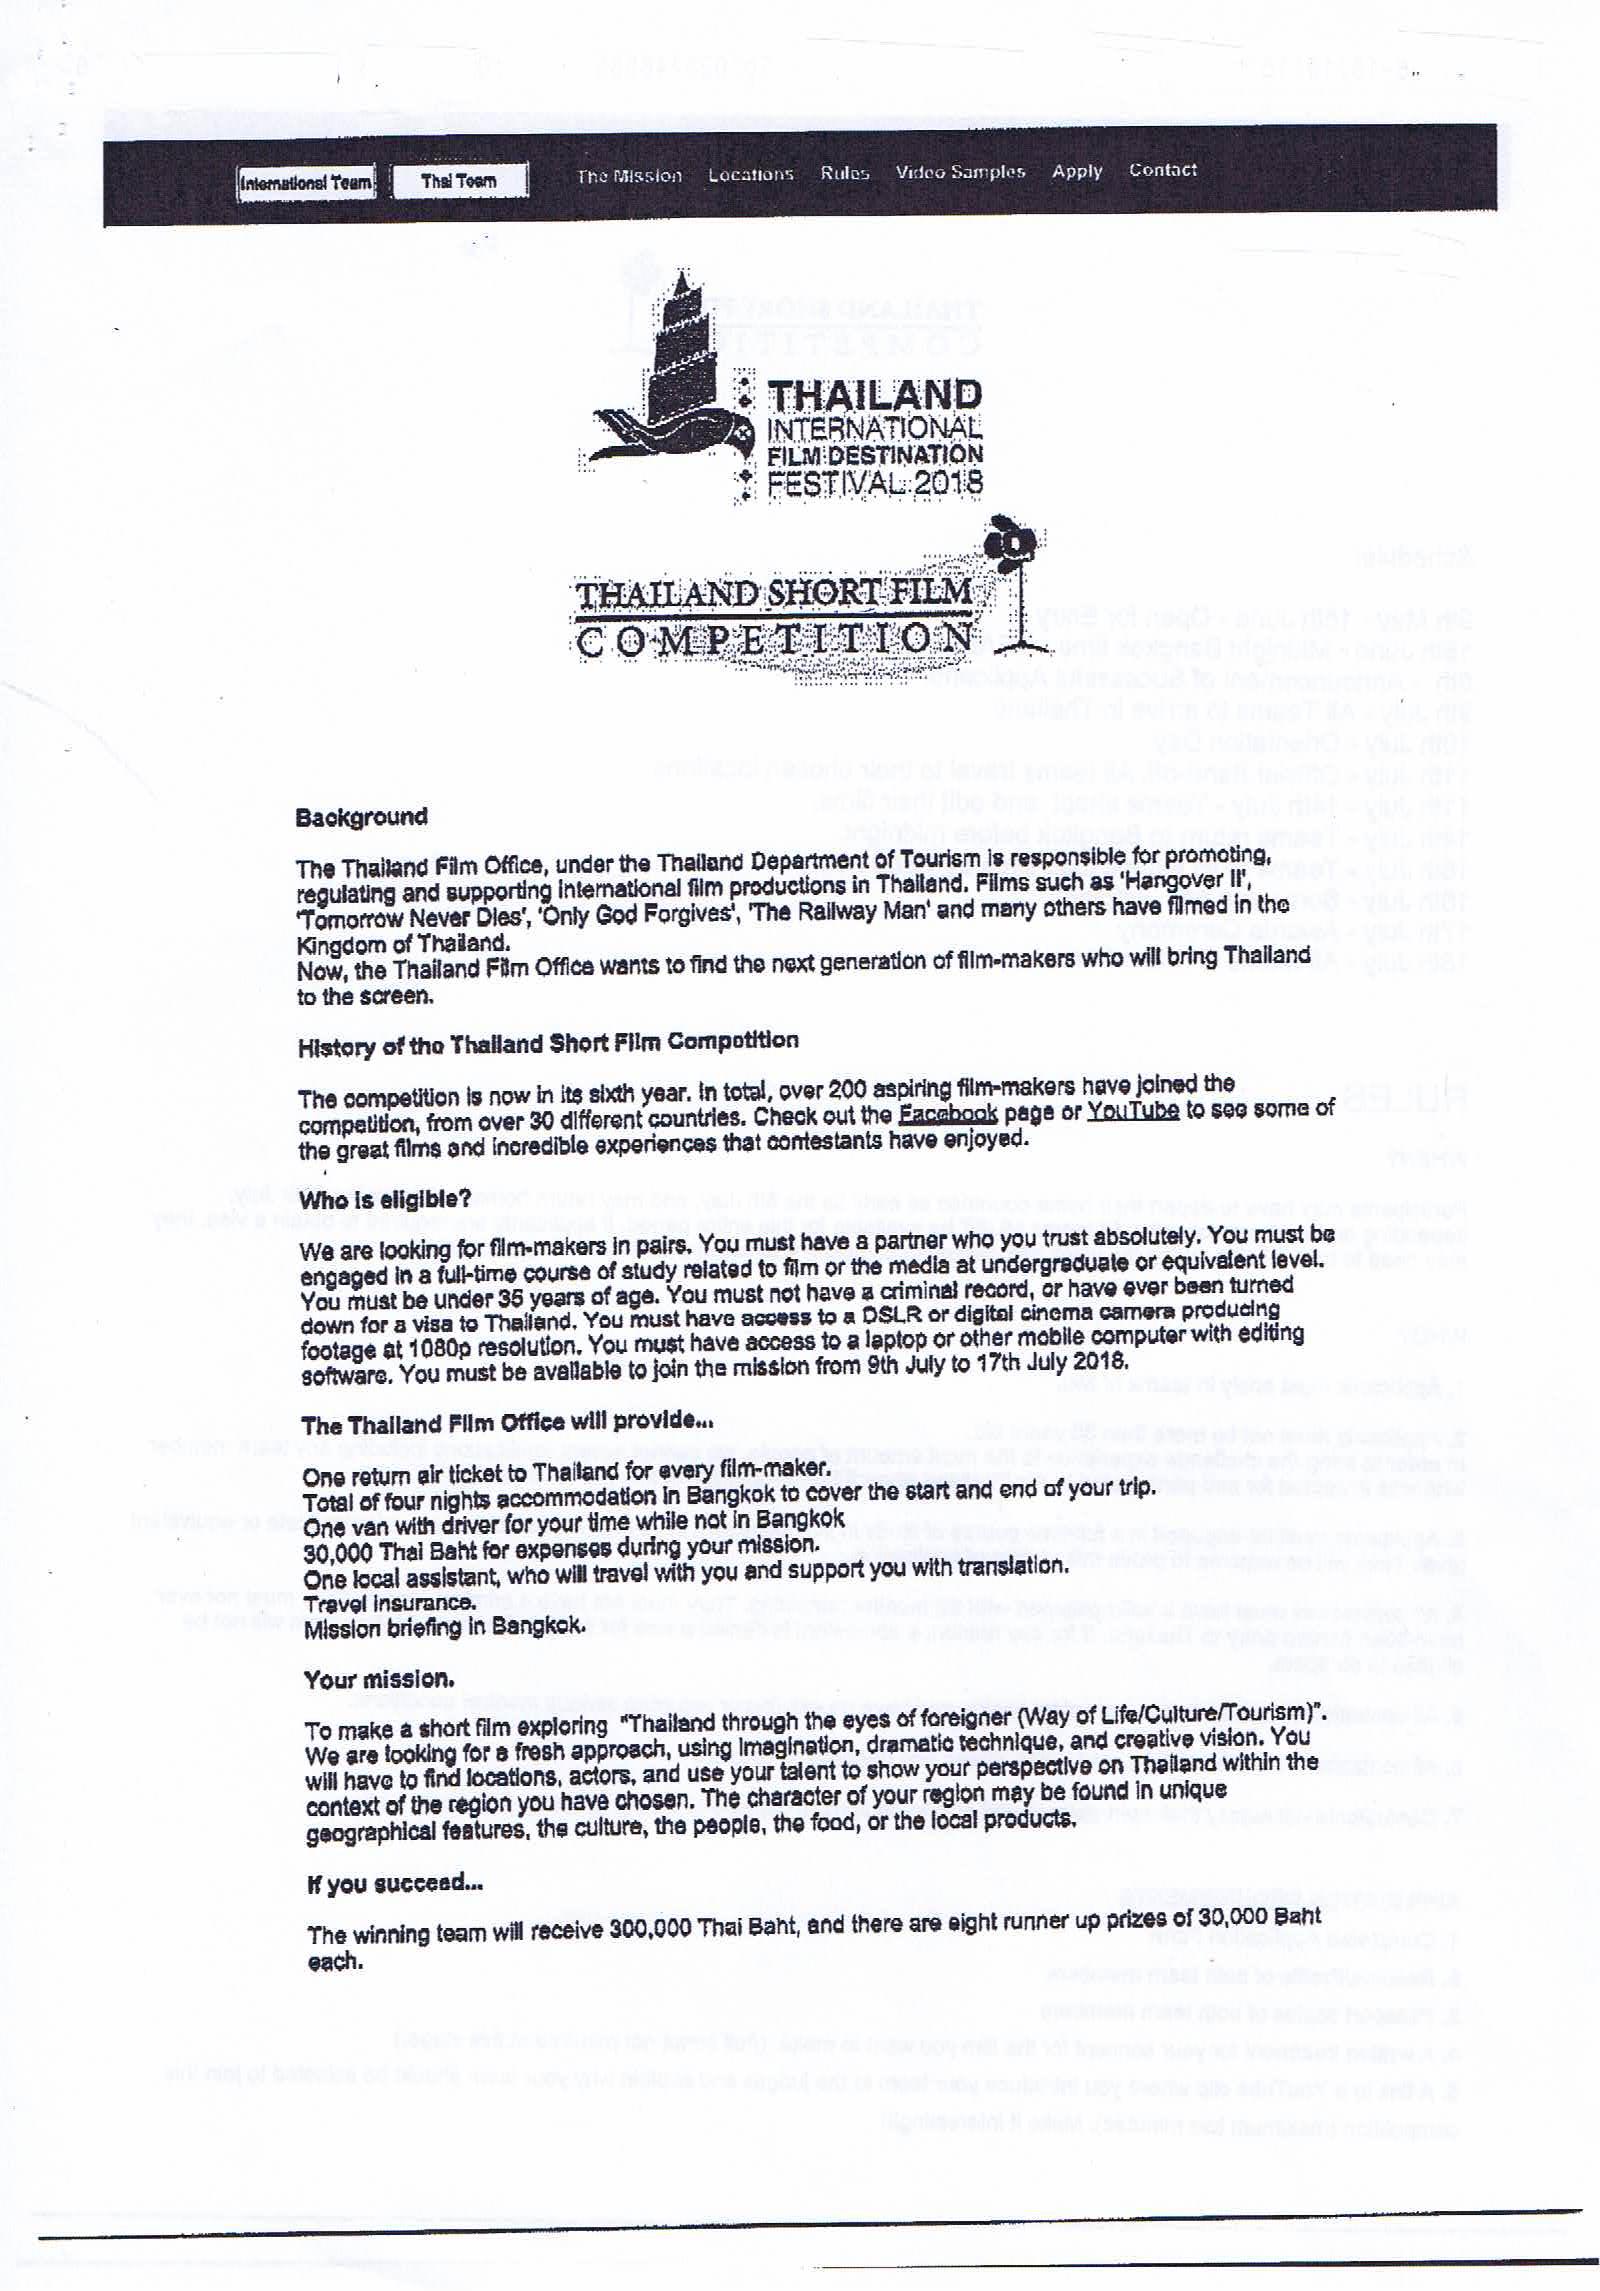 Thailand Short Film Competition